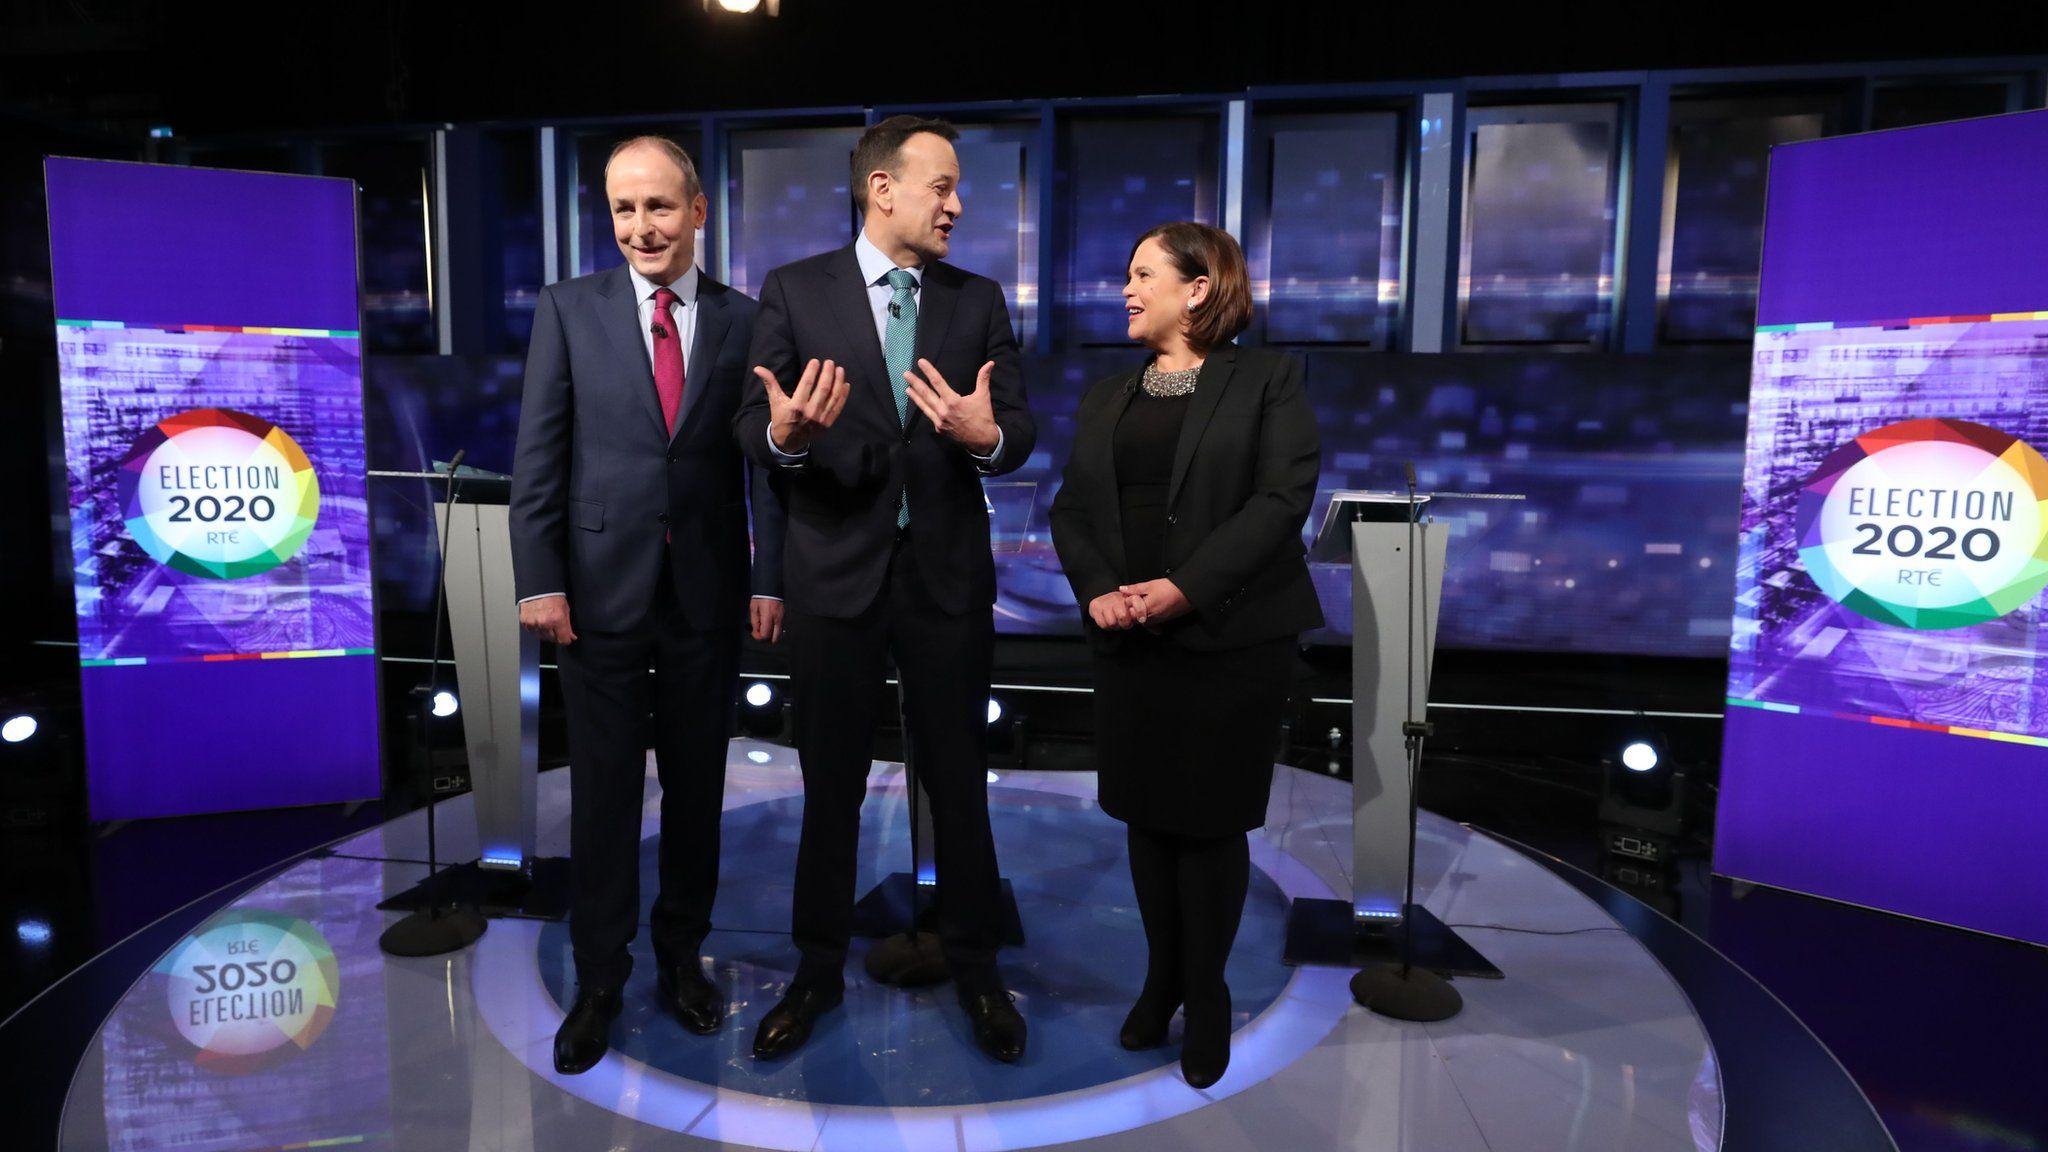 Irish political leaders Micheal Martin, Leo Varadkar and Mary Lou McDonald